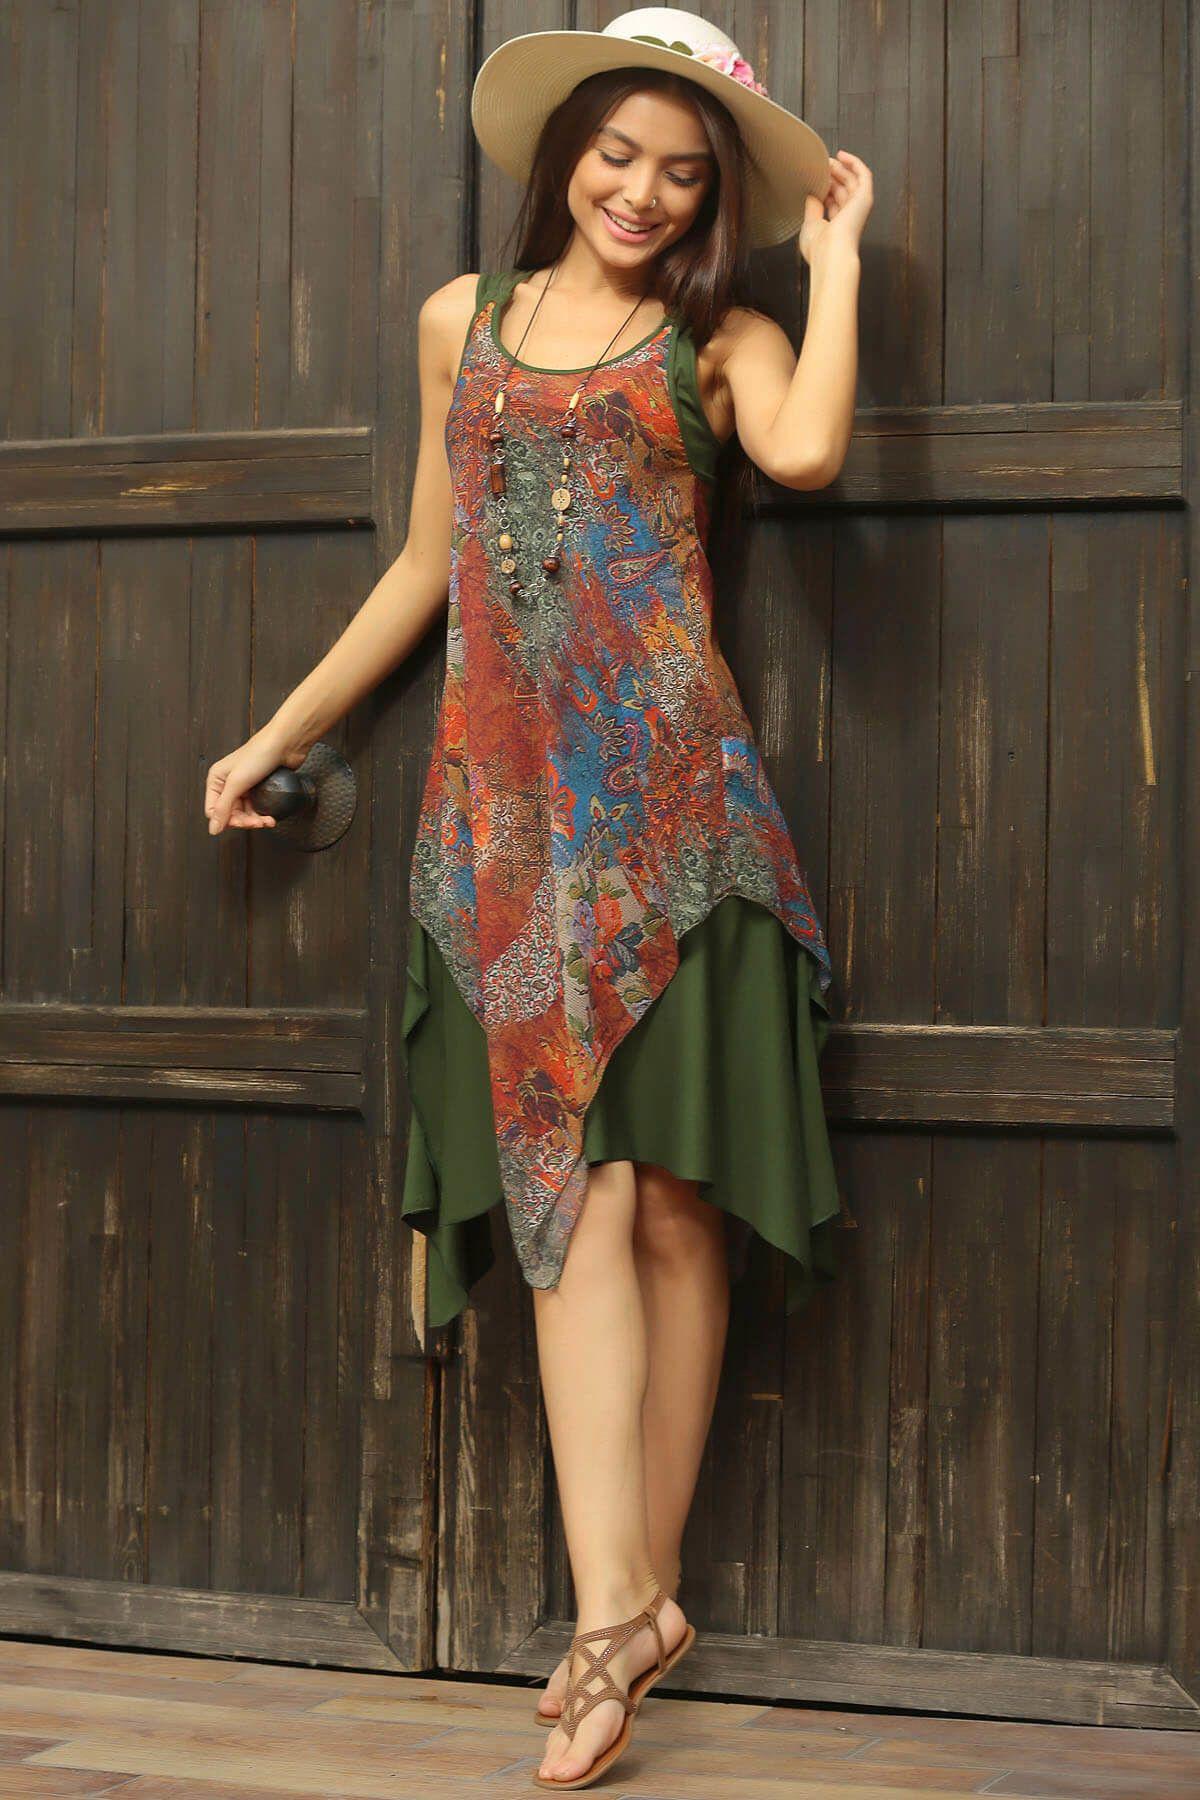 Kadin Haki Asimetrik Ustu Sifon Kolyeli Elbise Size Ozel Saygi Trendyol Women Blouses Fashion Fashion Clothes For Women